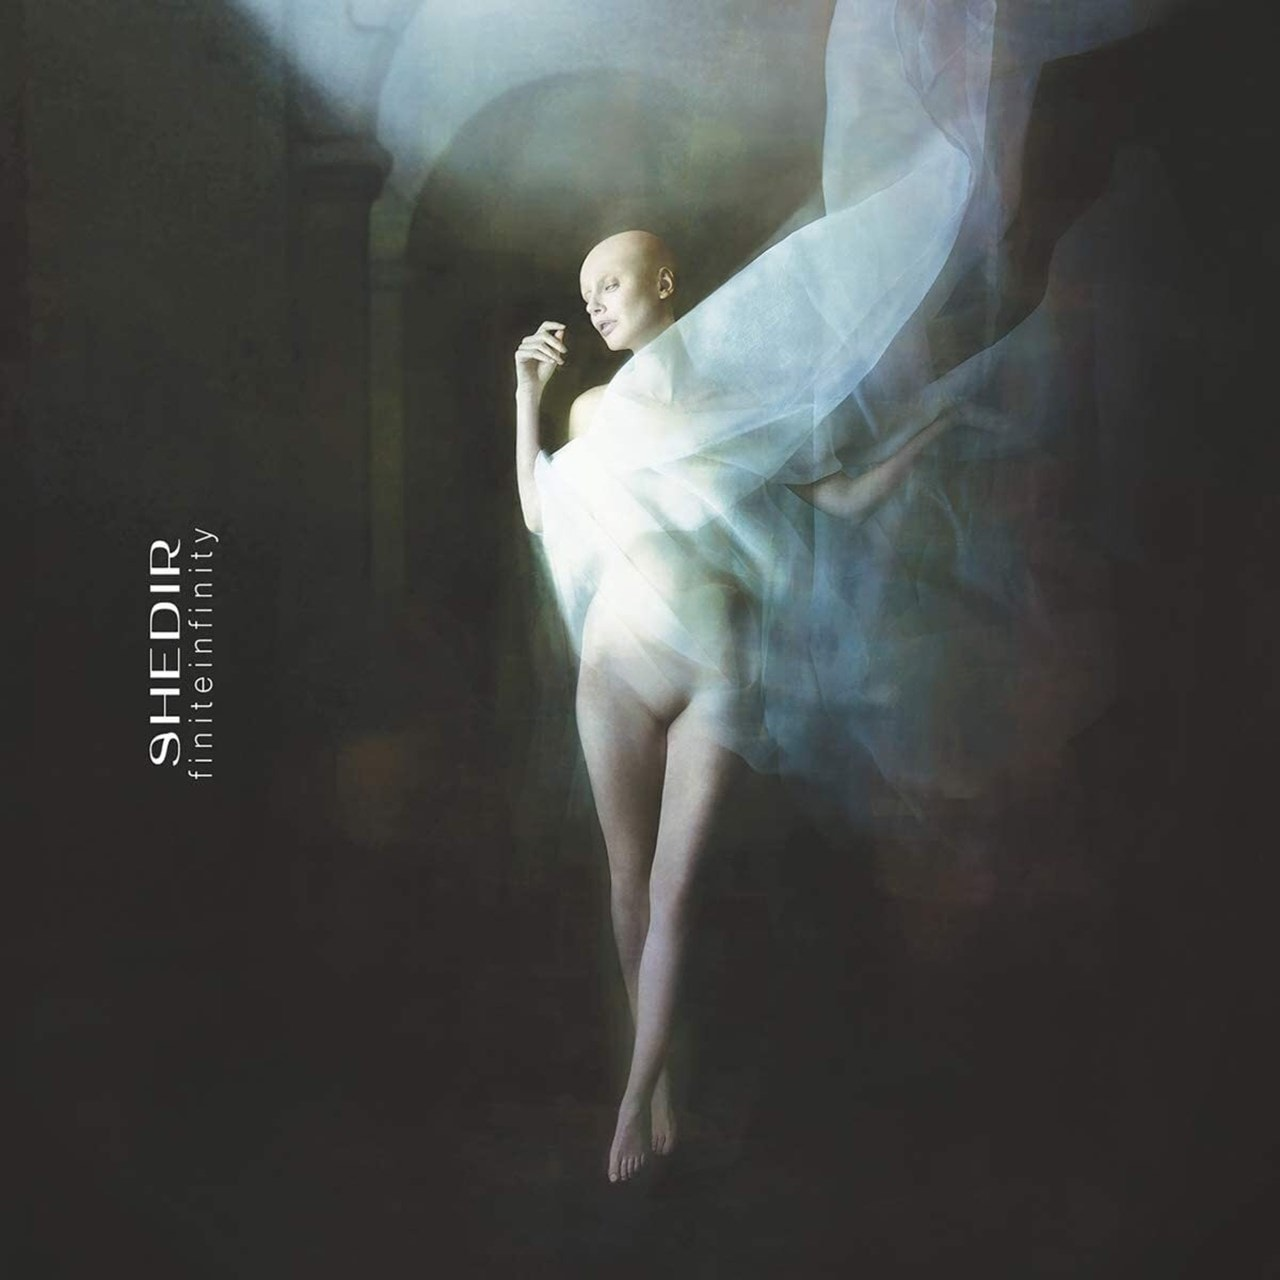 Finite Infinity - 1